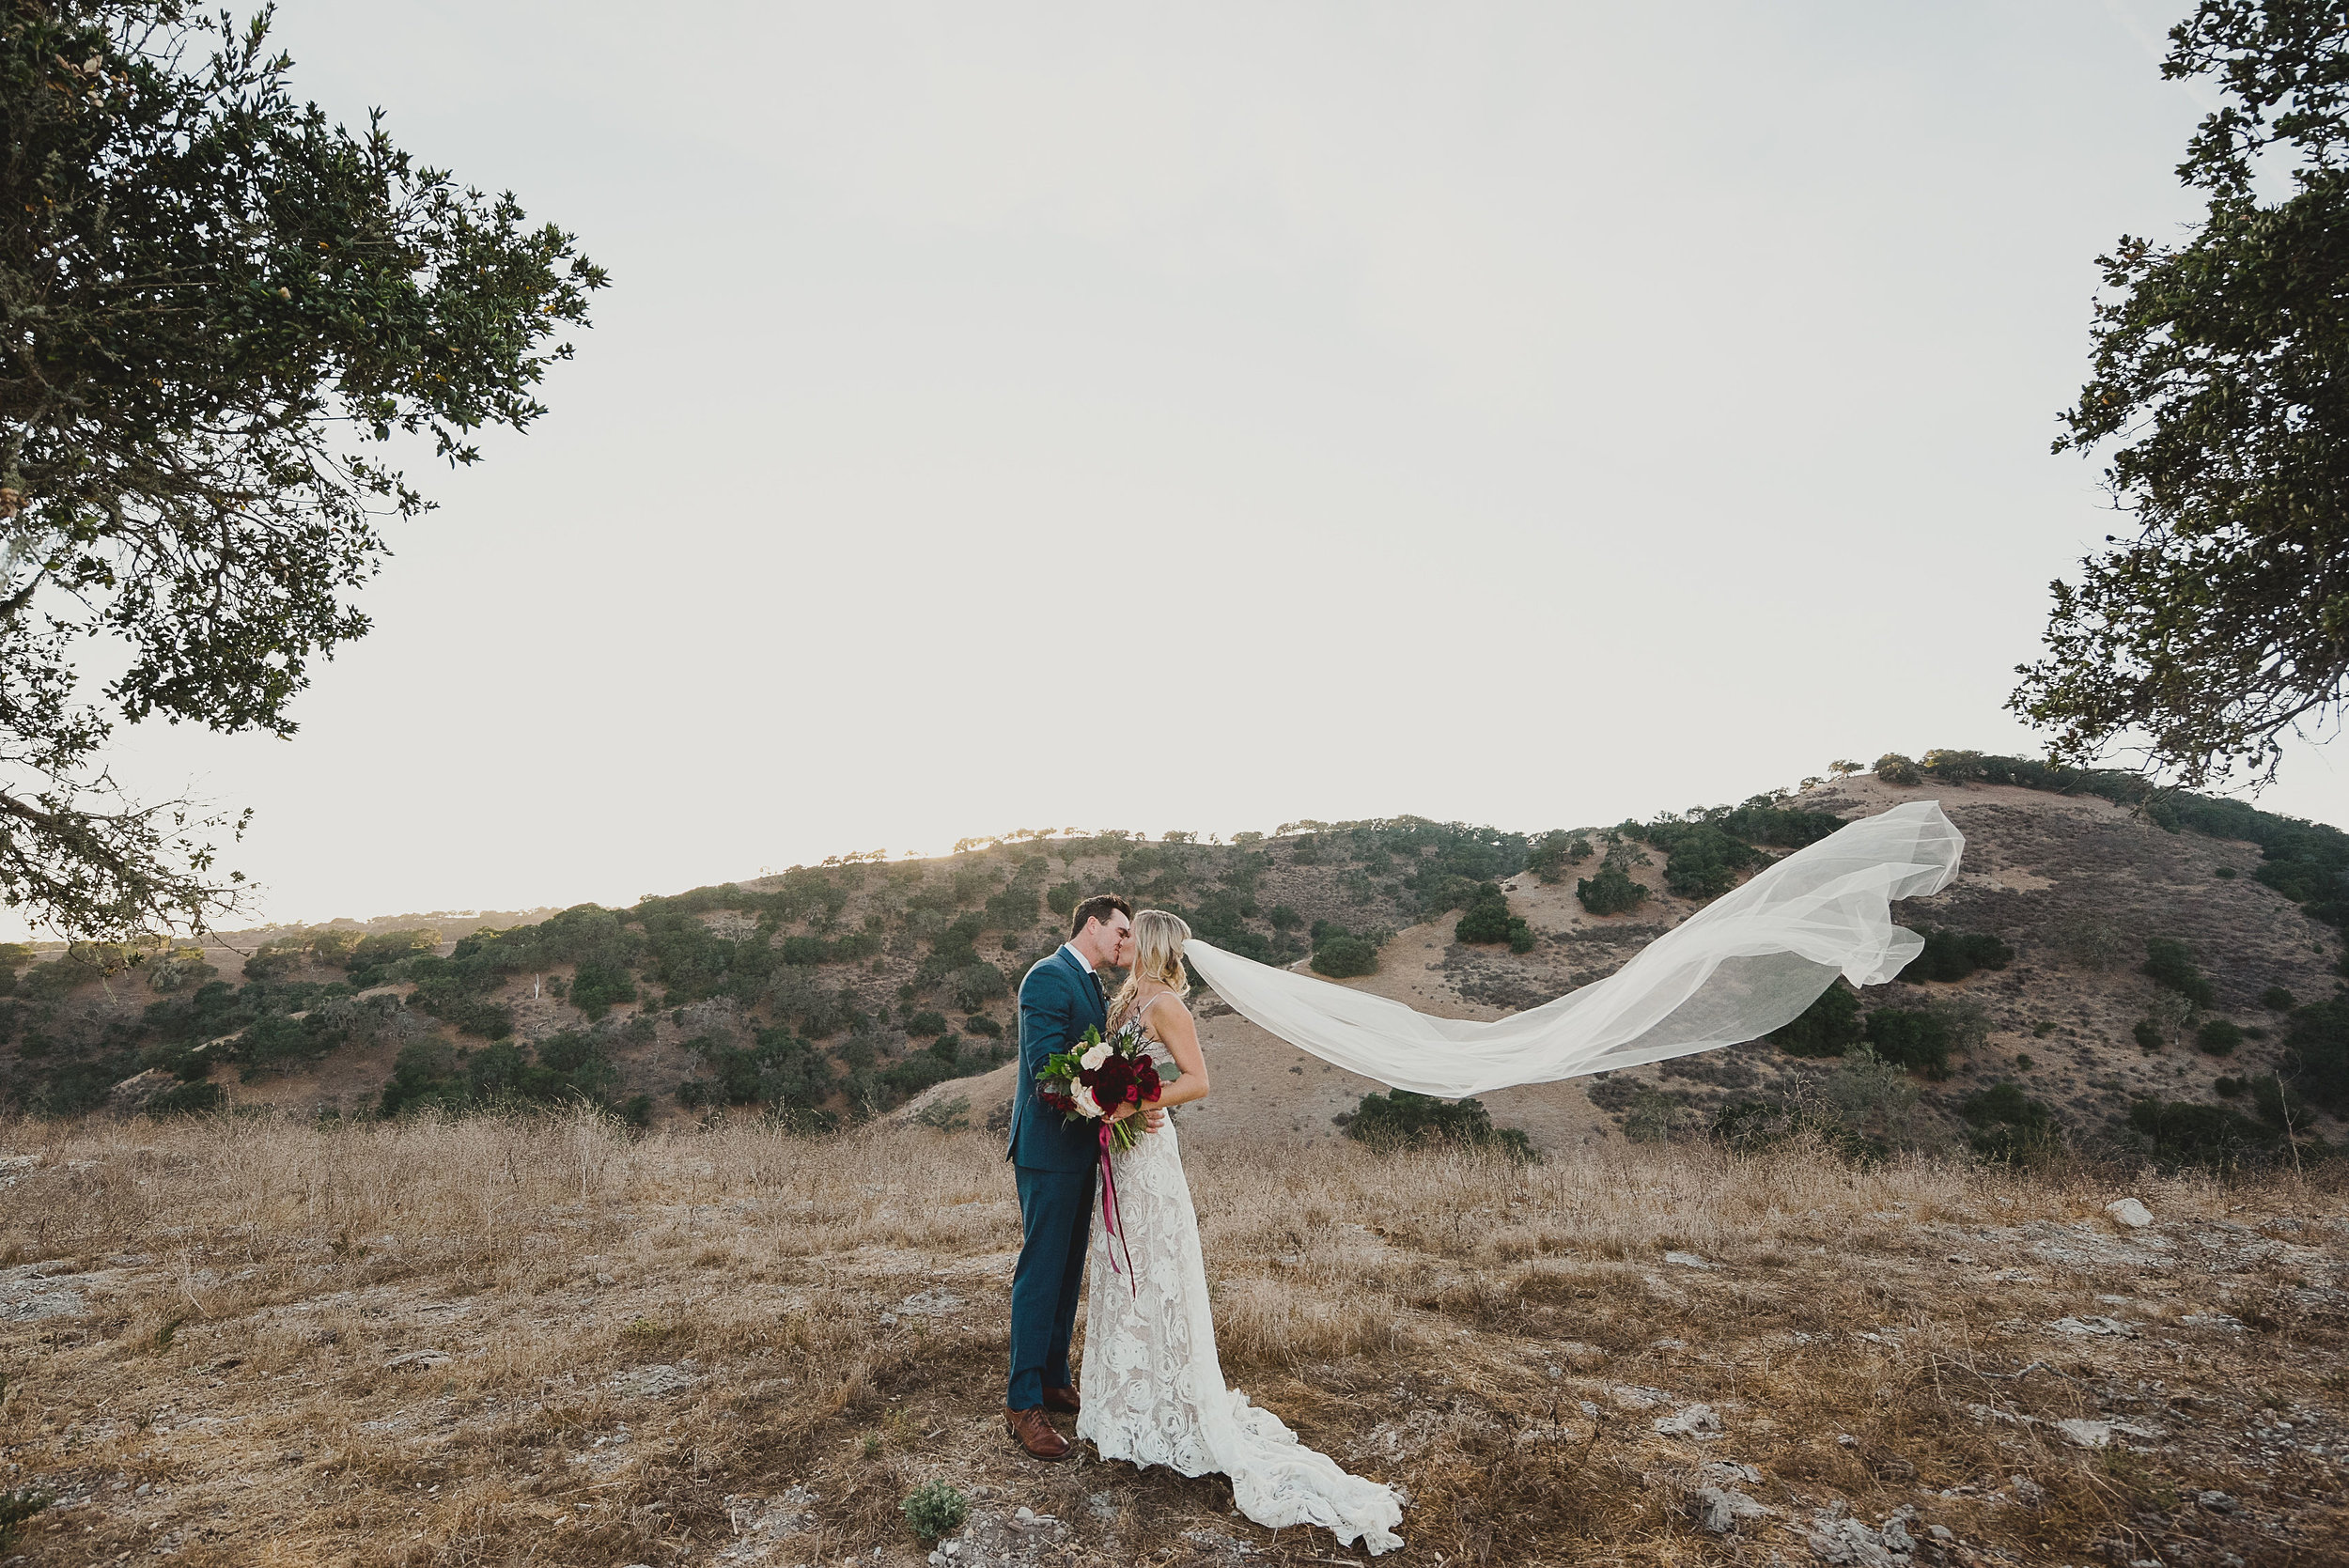 181026-Marisa-JB-Wedding-5022.jpg